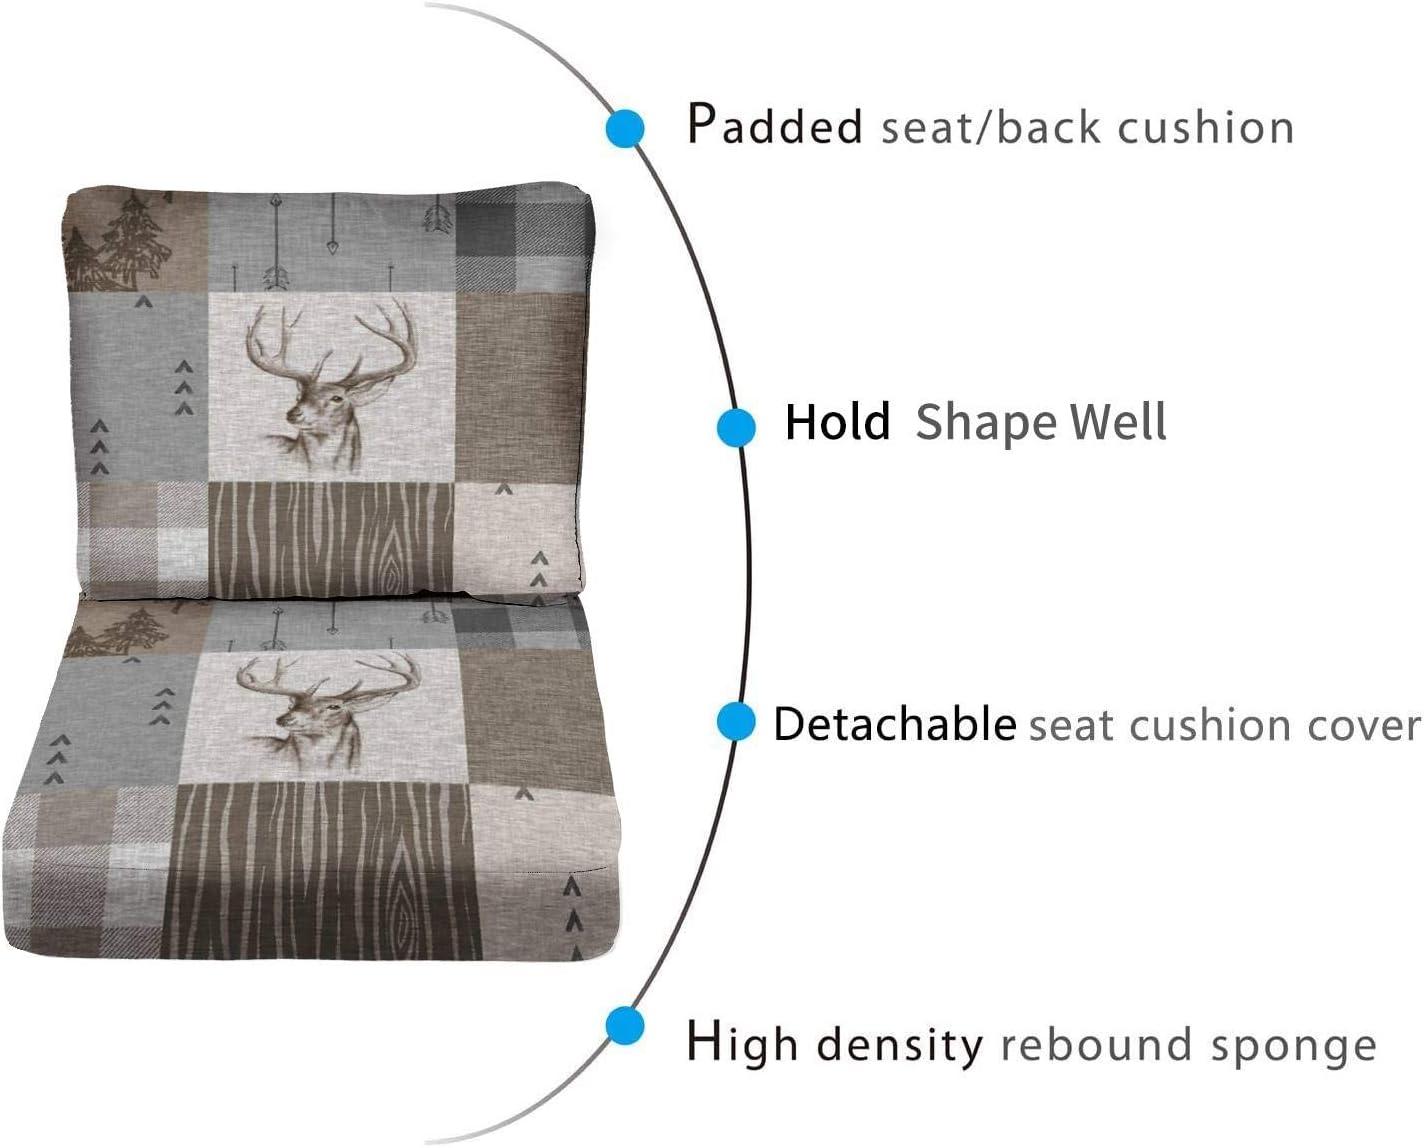 ONENPENRI 2-Piece Outdoor Deep Seat Cushion Set Deer Patchwork Rustic Neutrals Back Seat Lounge Chair Conversation Cushion Review